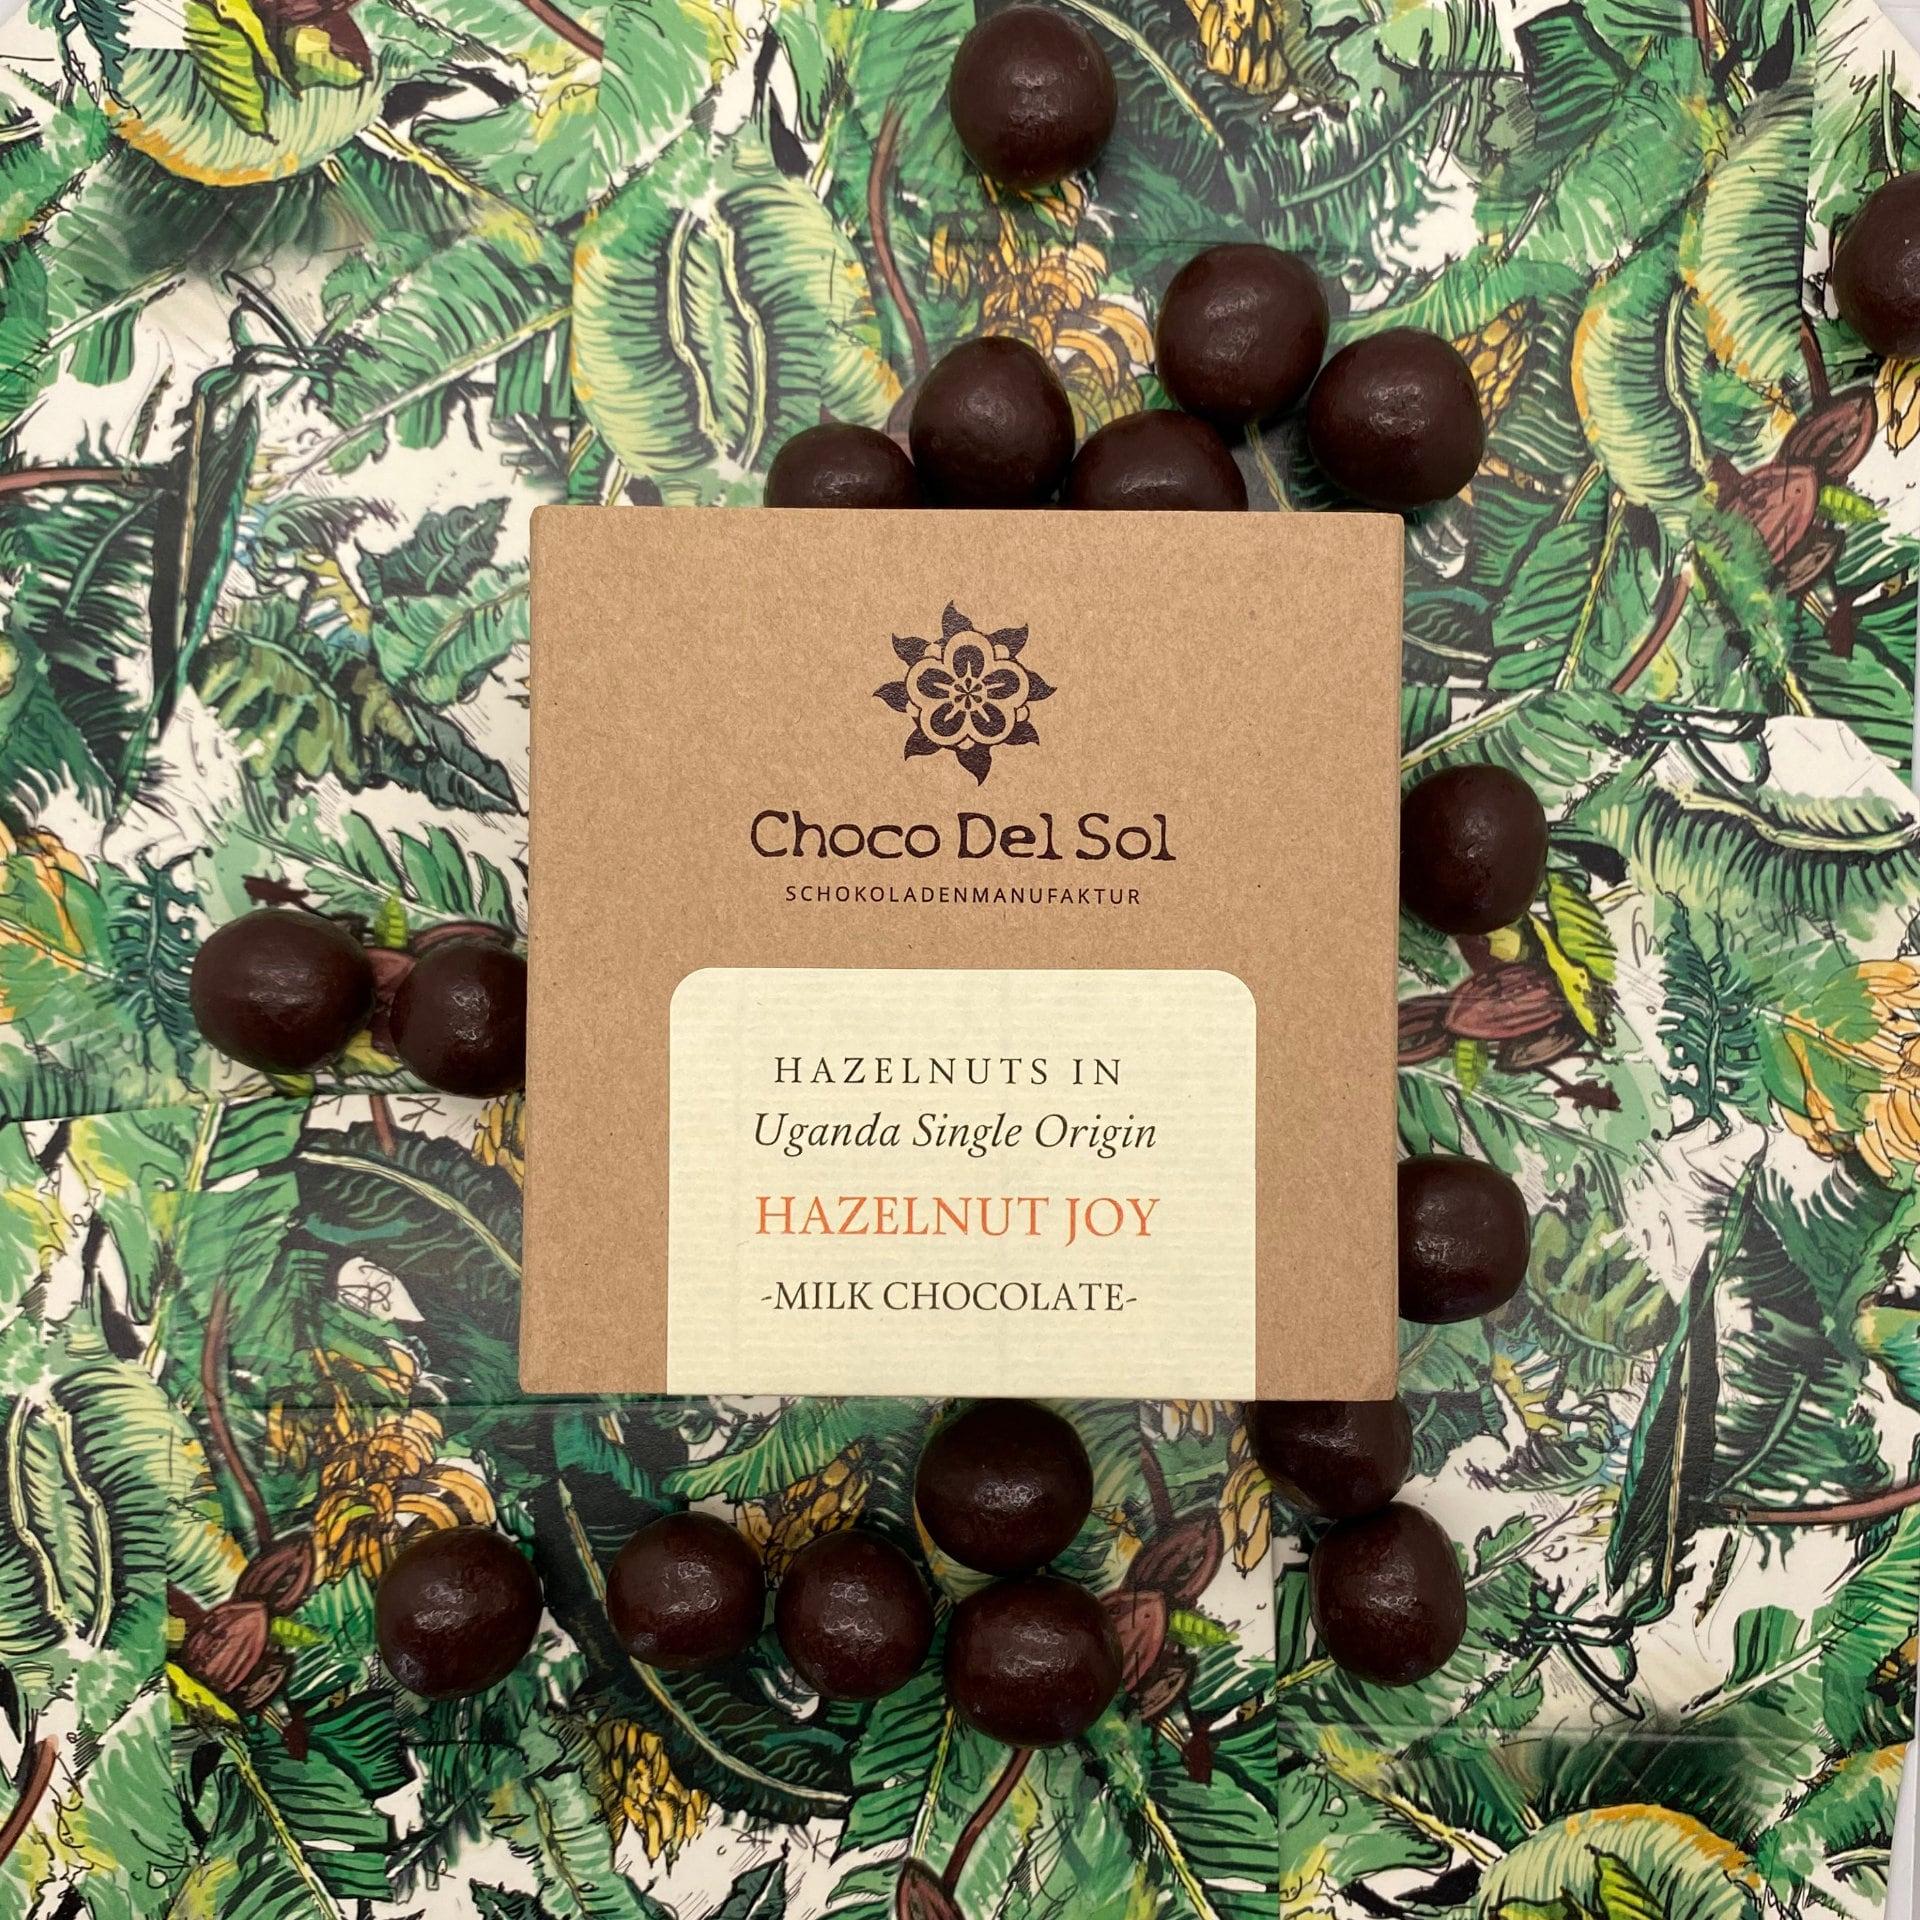 CHOCO DEL SOL | Schokoladendragees Haselnüsse & Milchschokolade »Hazelnut Joy« 55% | BIO